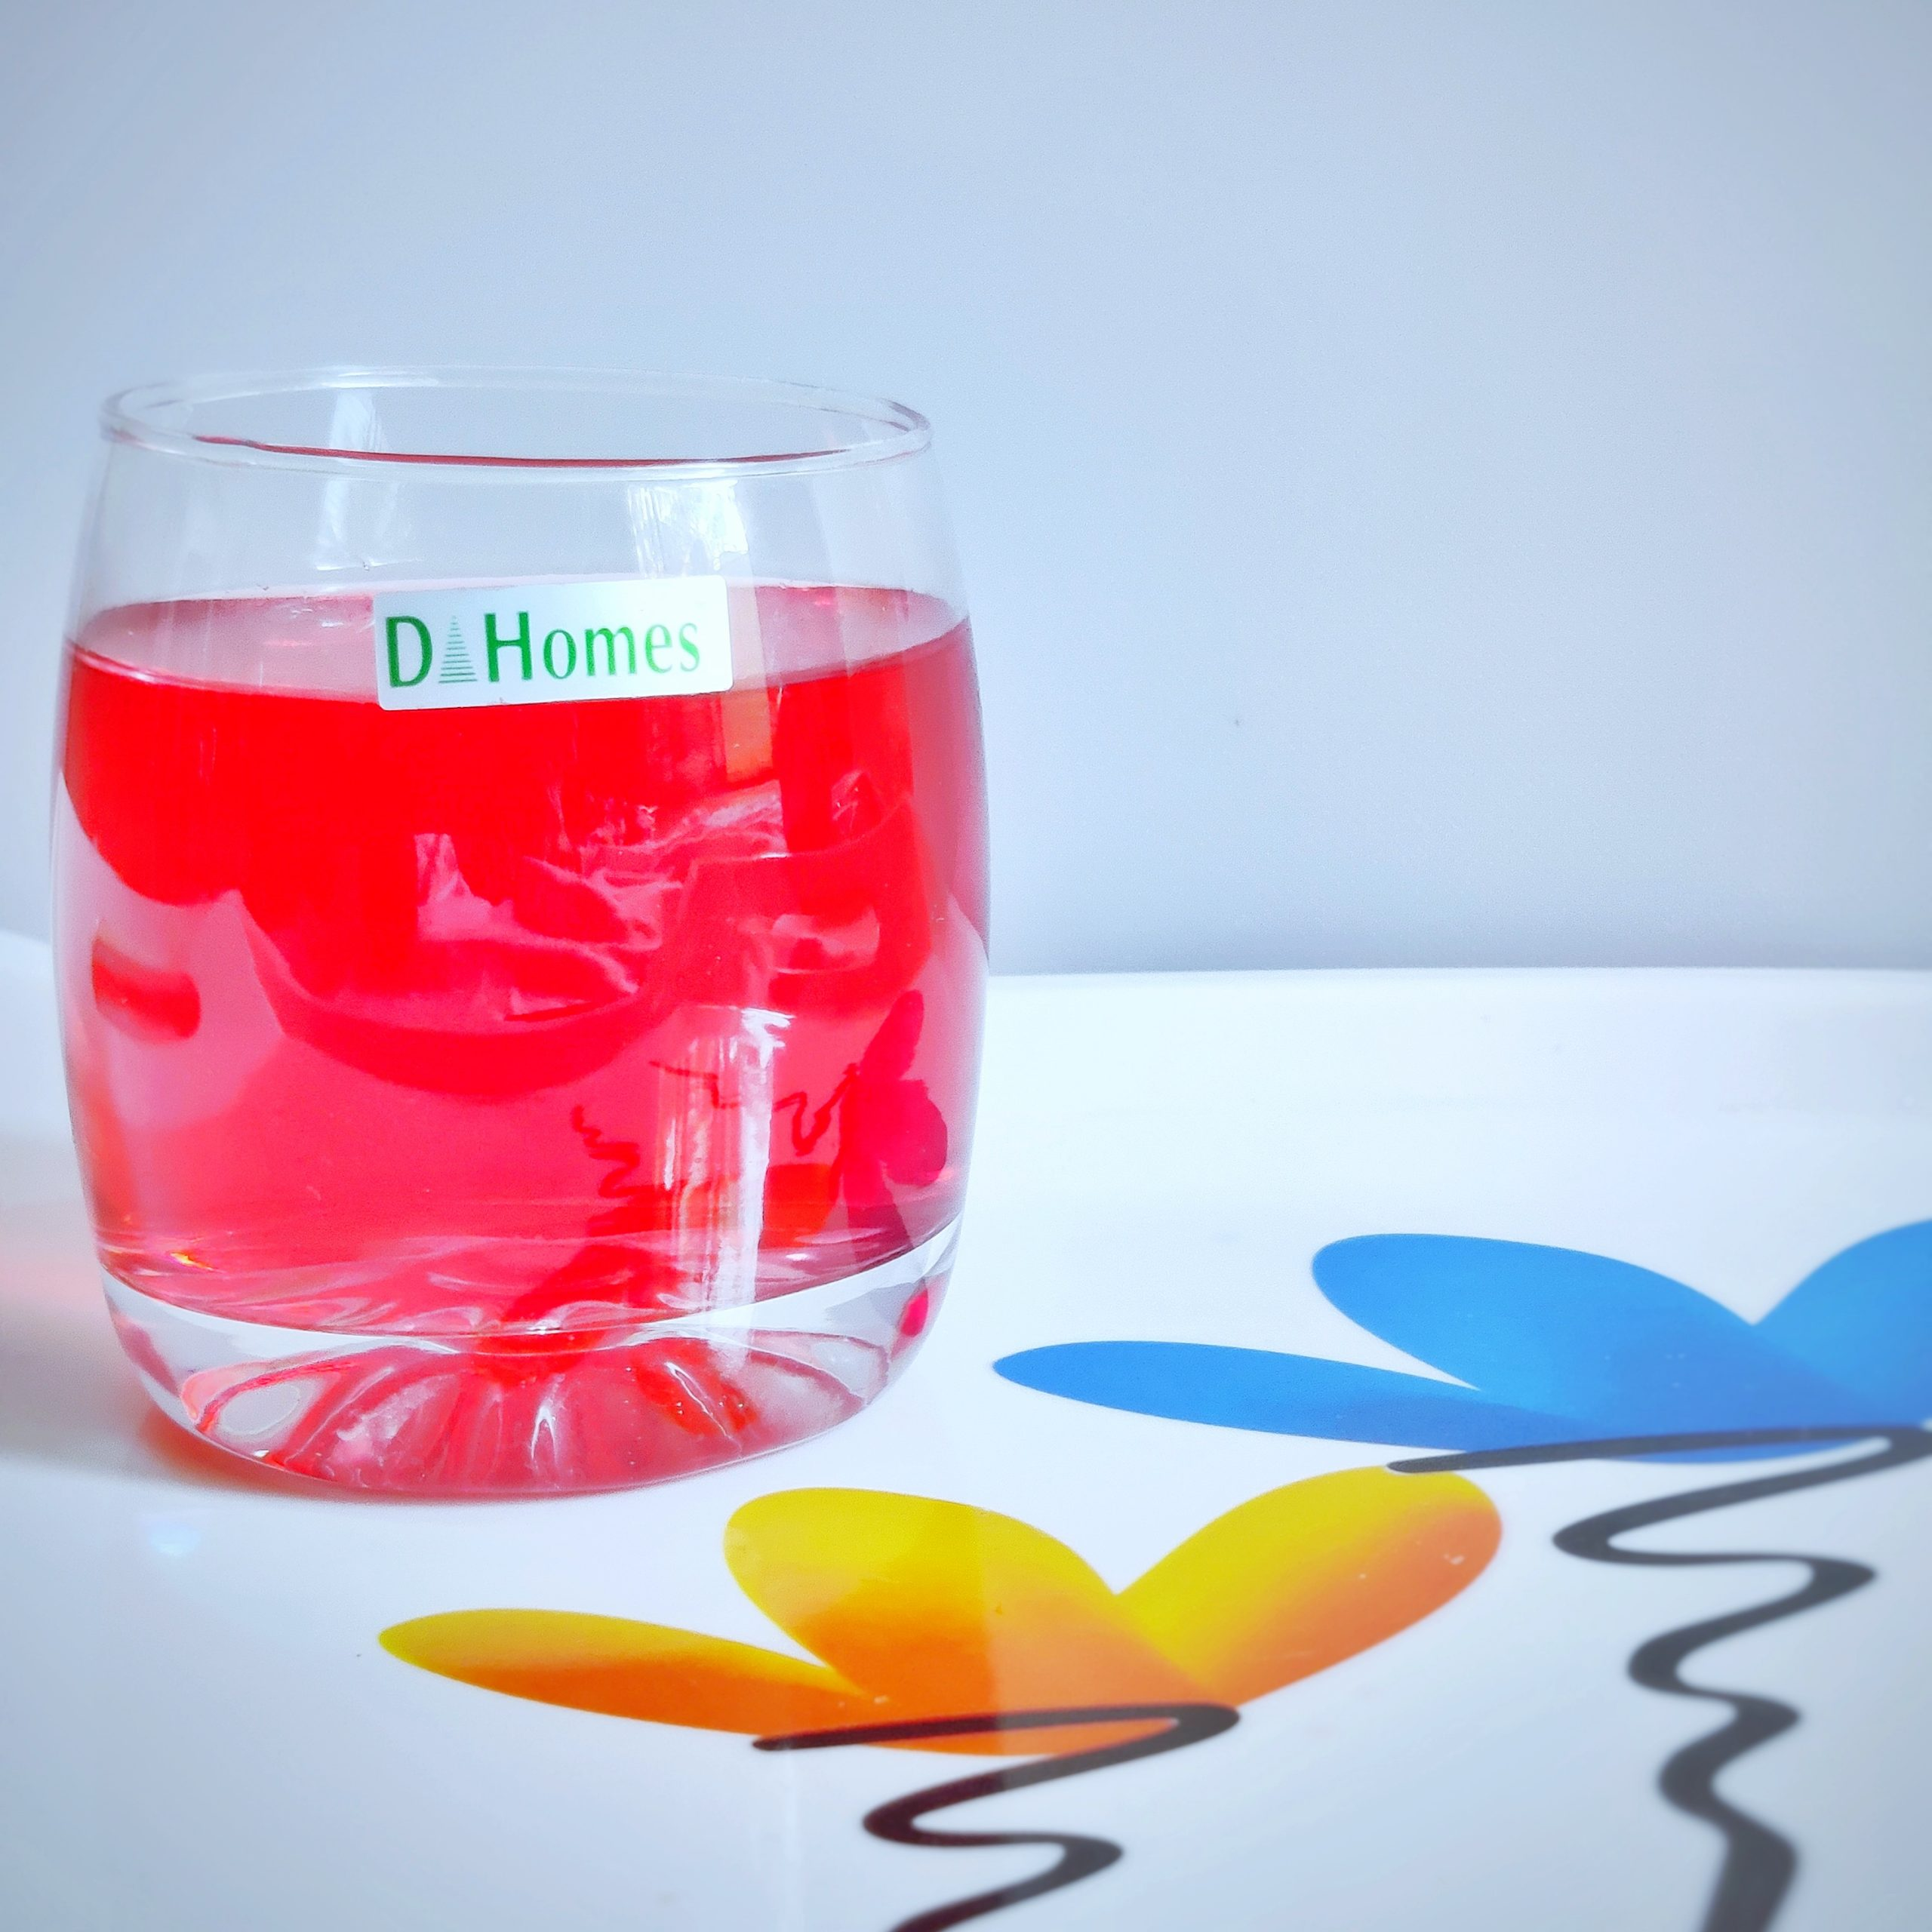 A juice glass